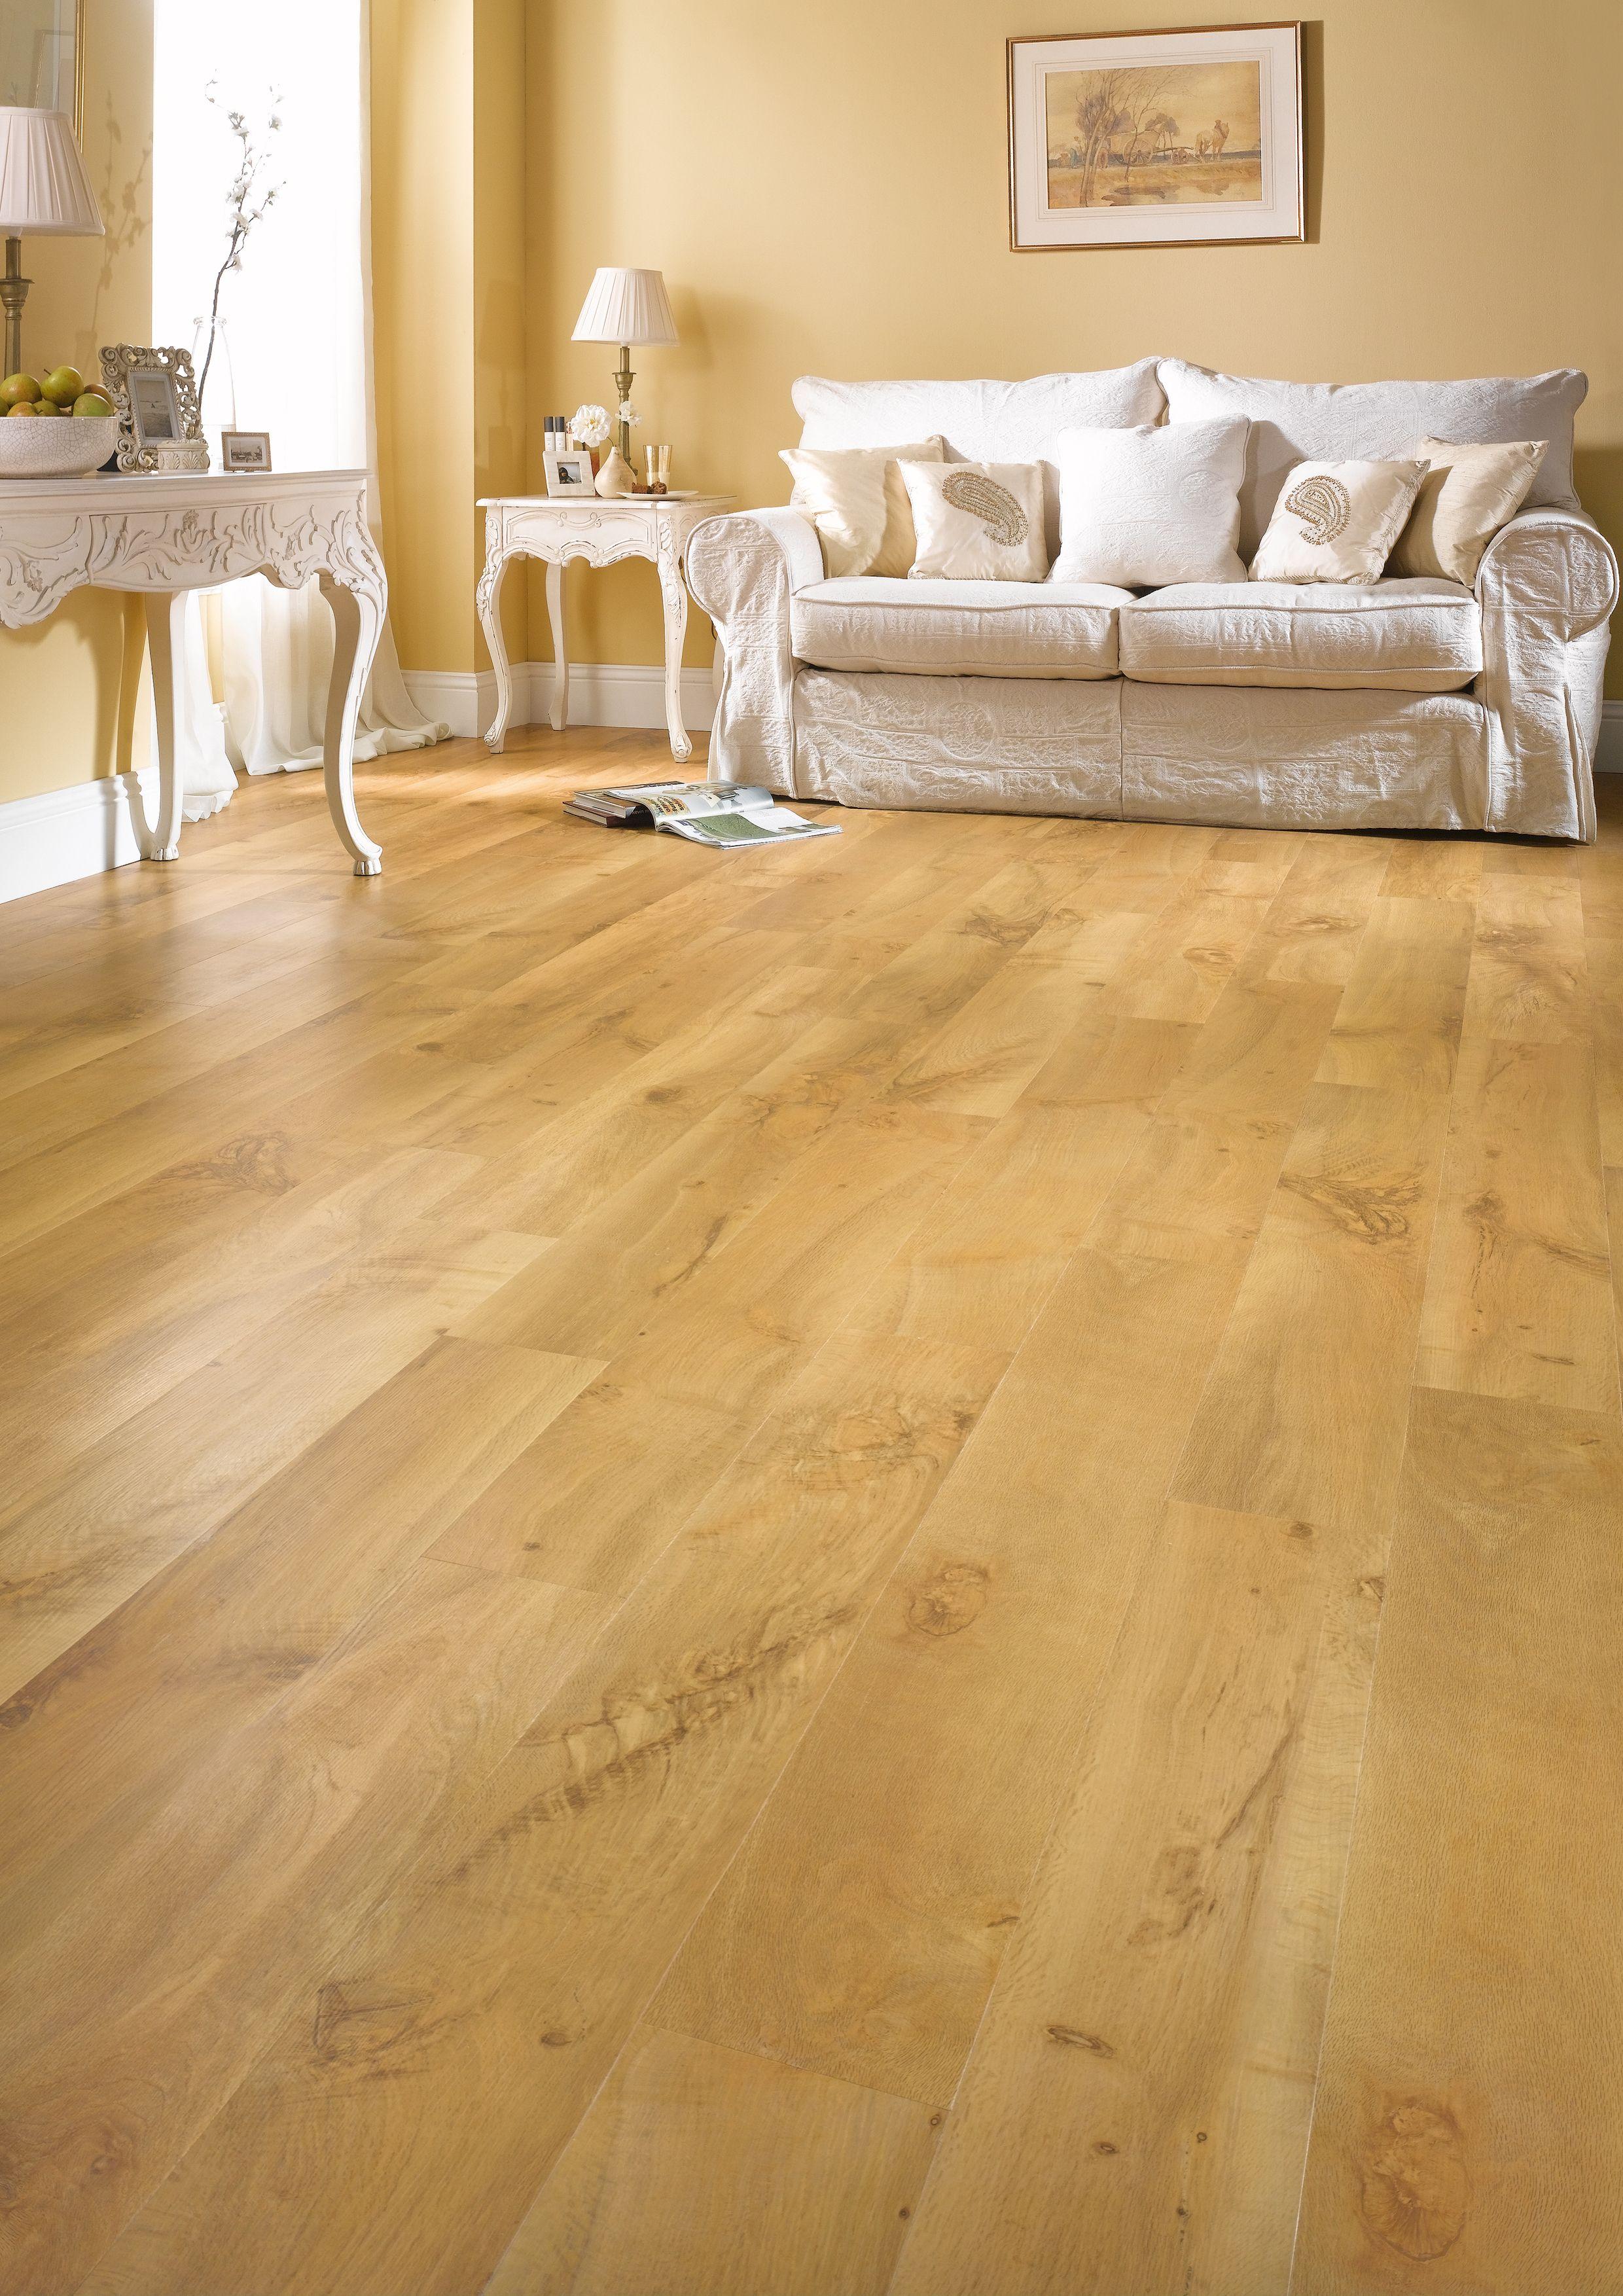 ideas classic style van flooring floor products design karndean gogh oak